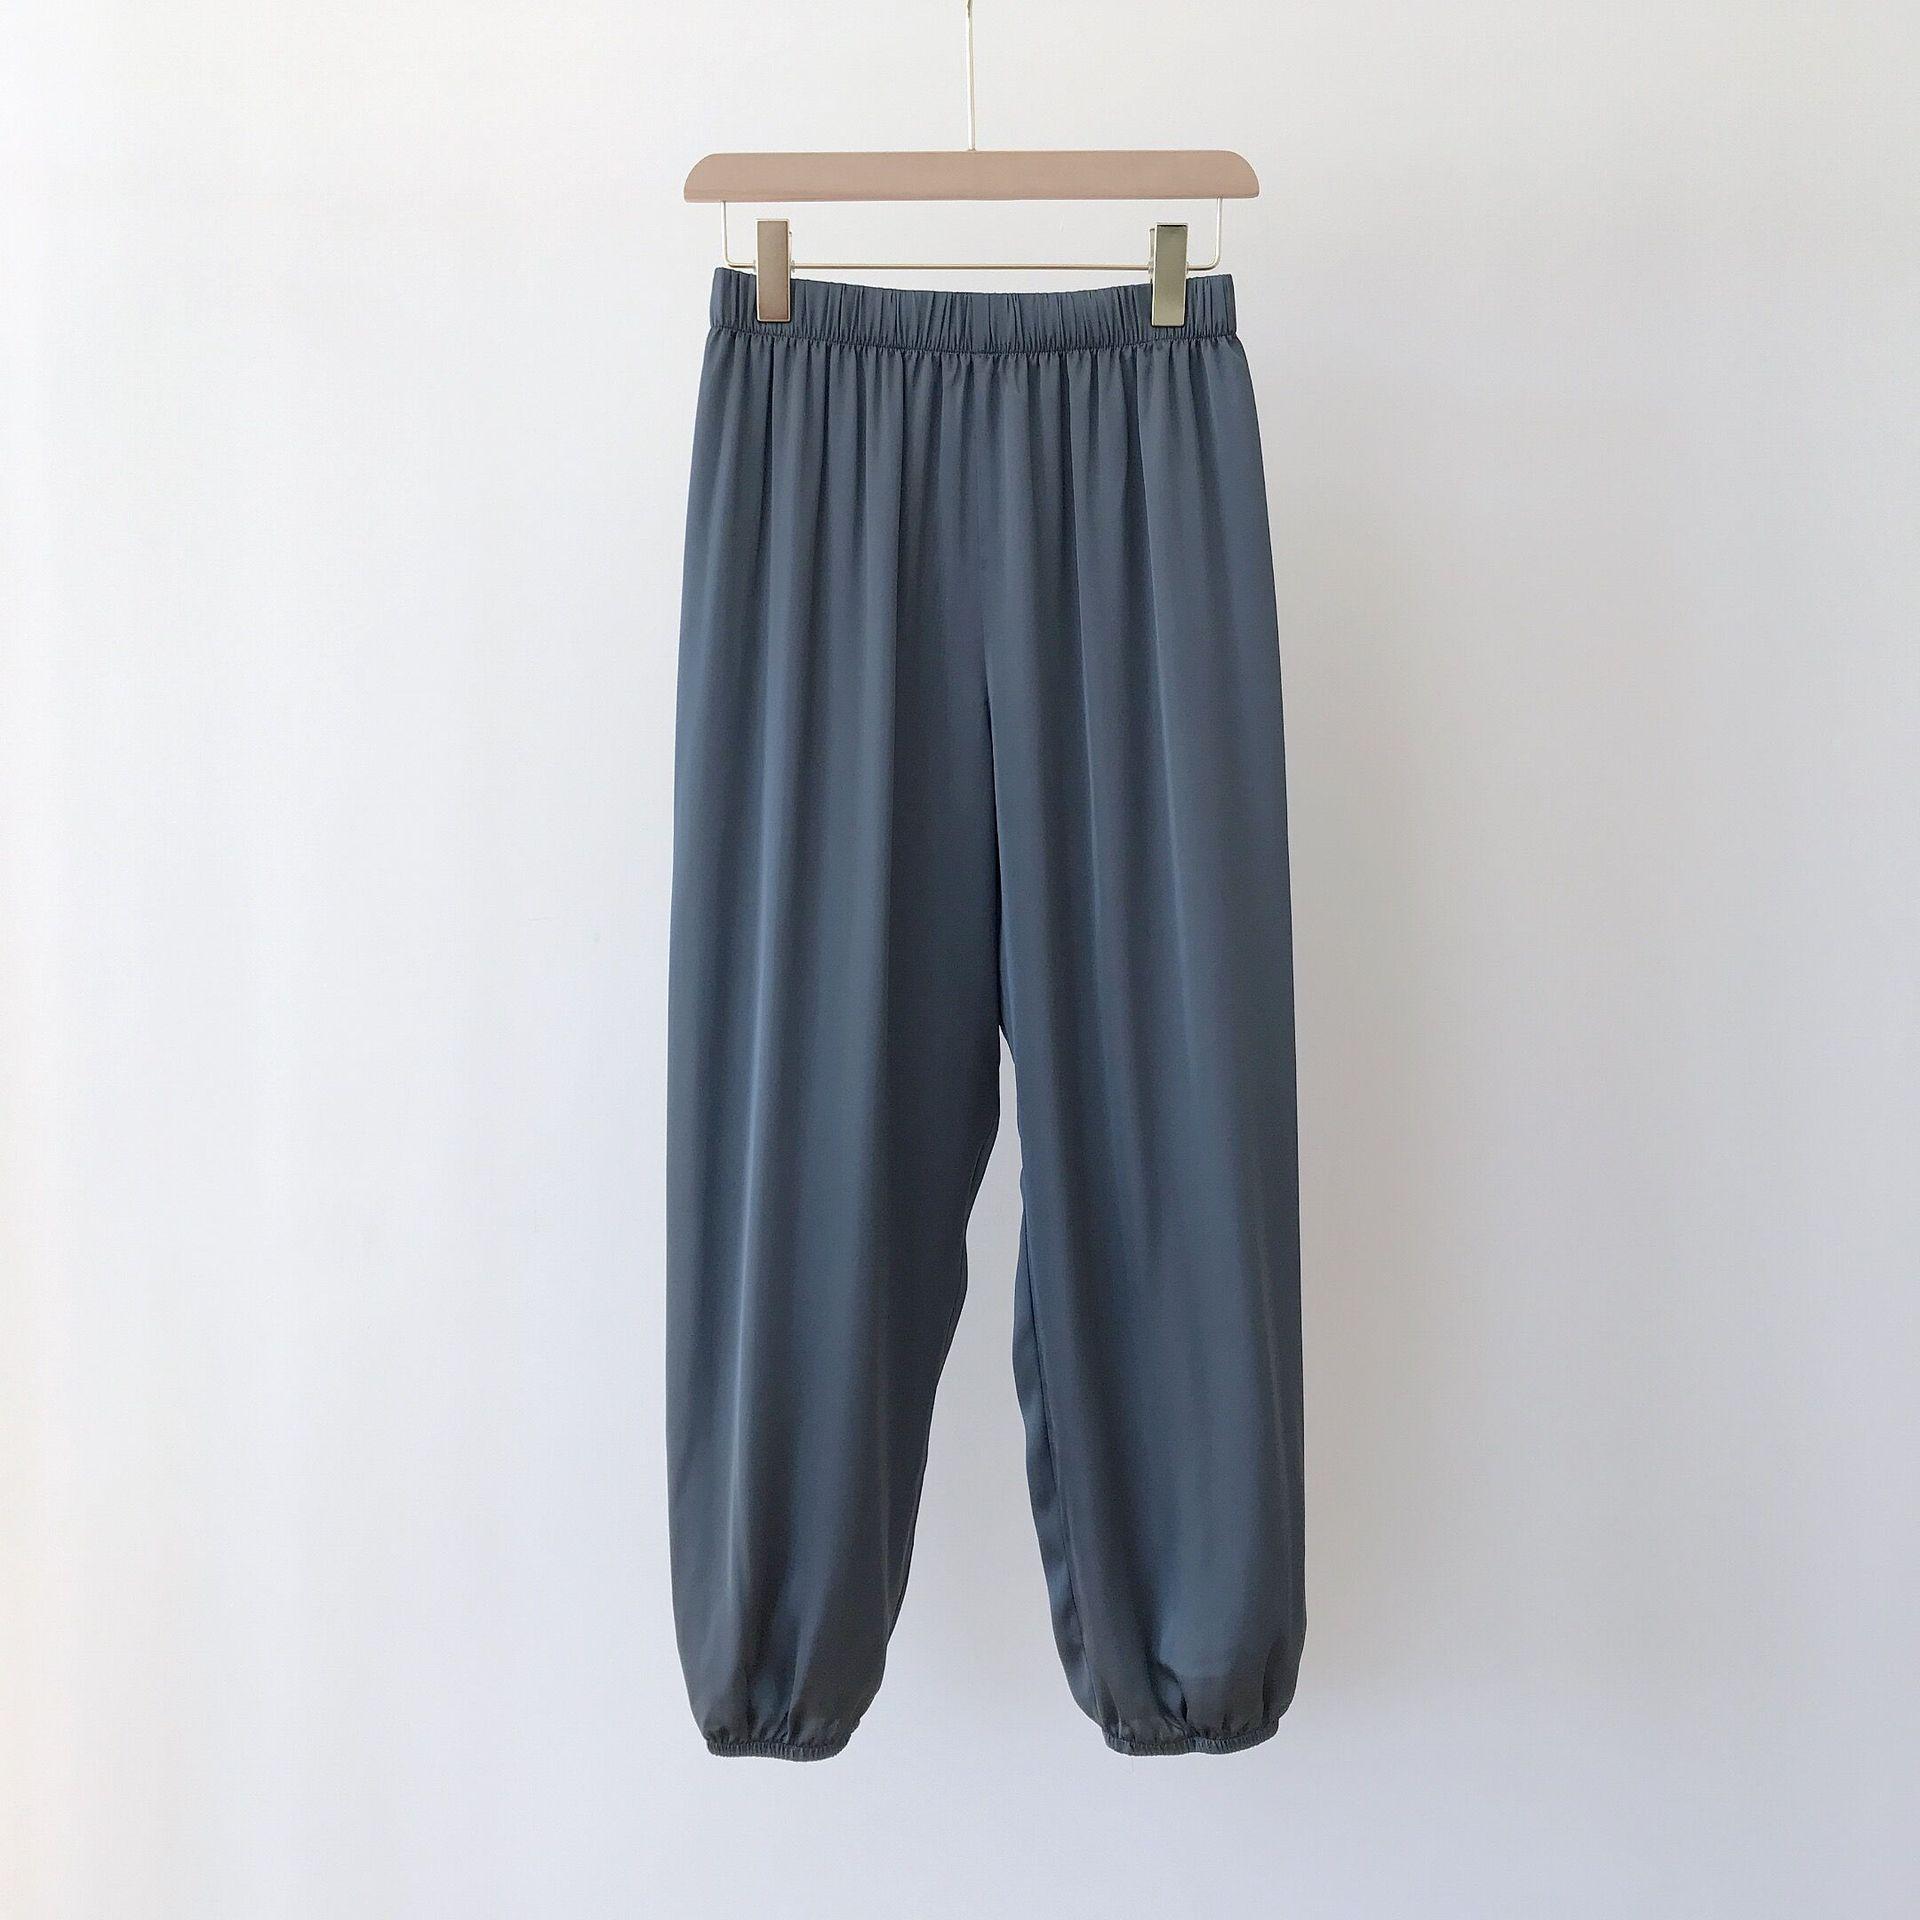 LXS22 Summer Women's Thin Wide-leg Slim Thin Versatile Casual Straight Trousers